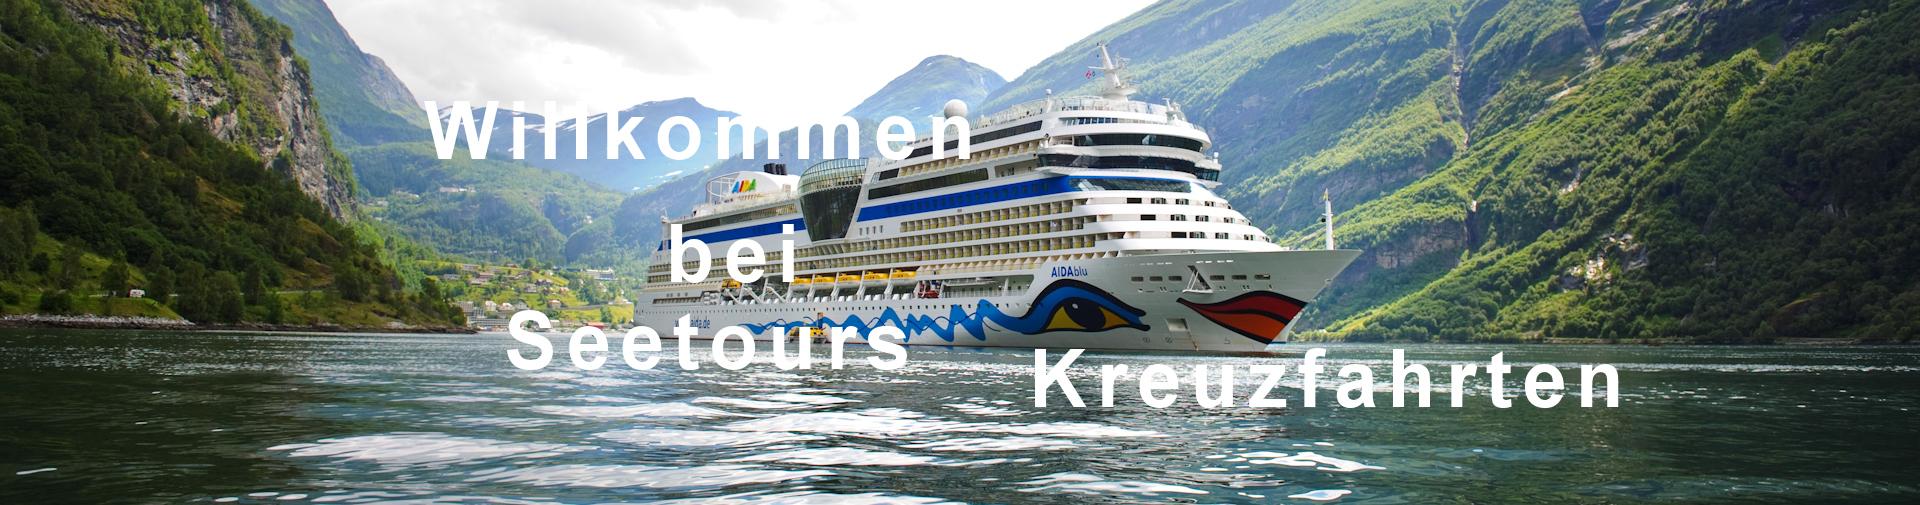 Willkommen bei Seetours